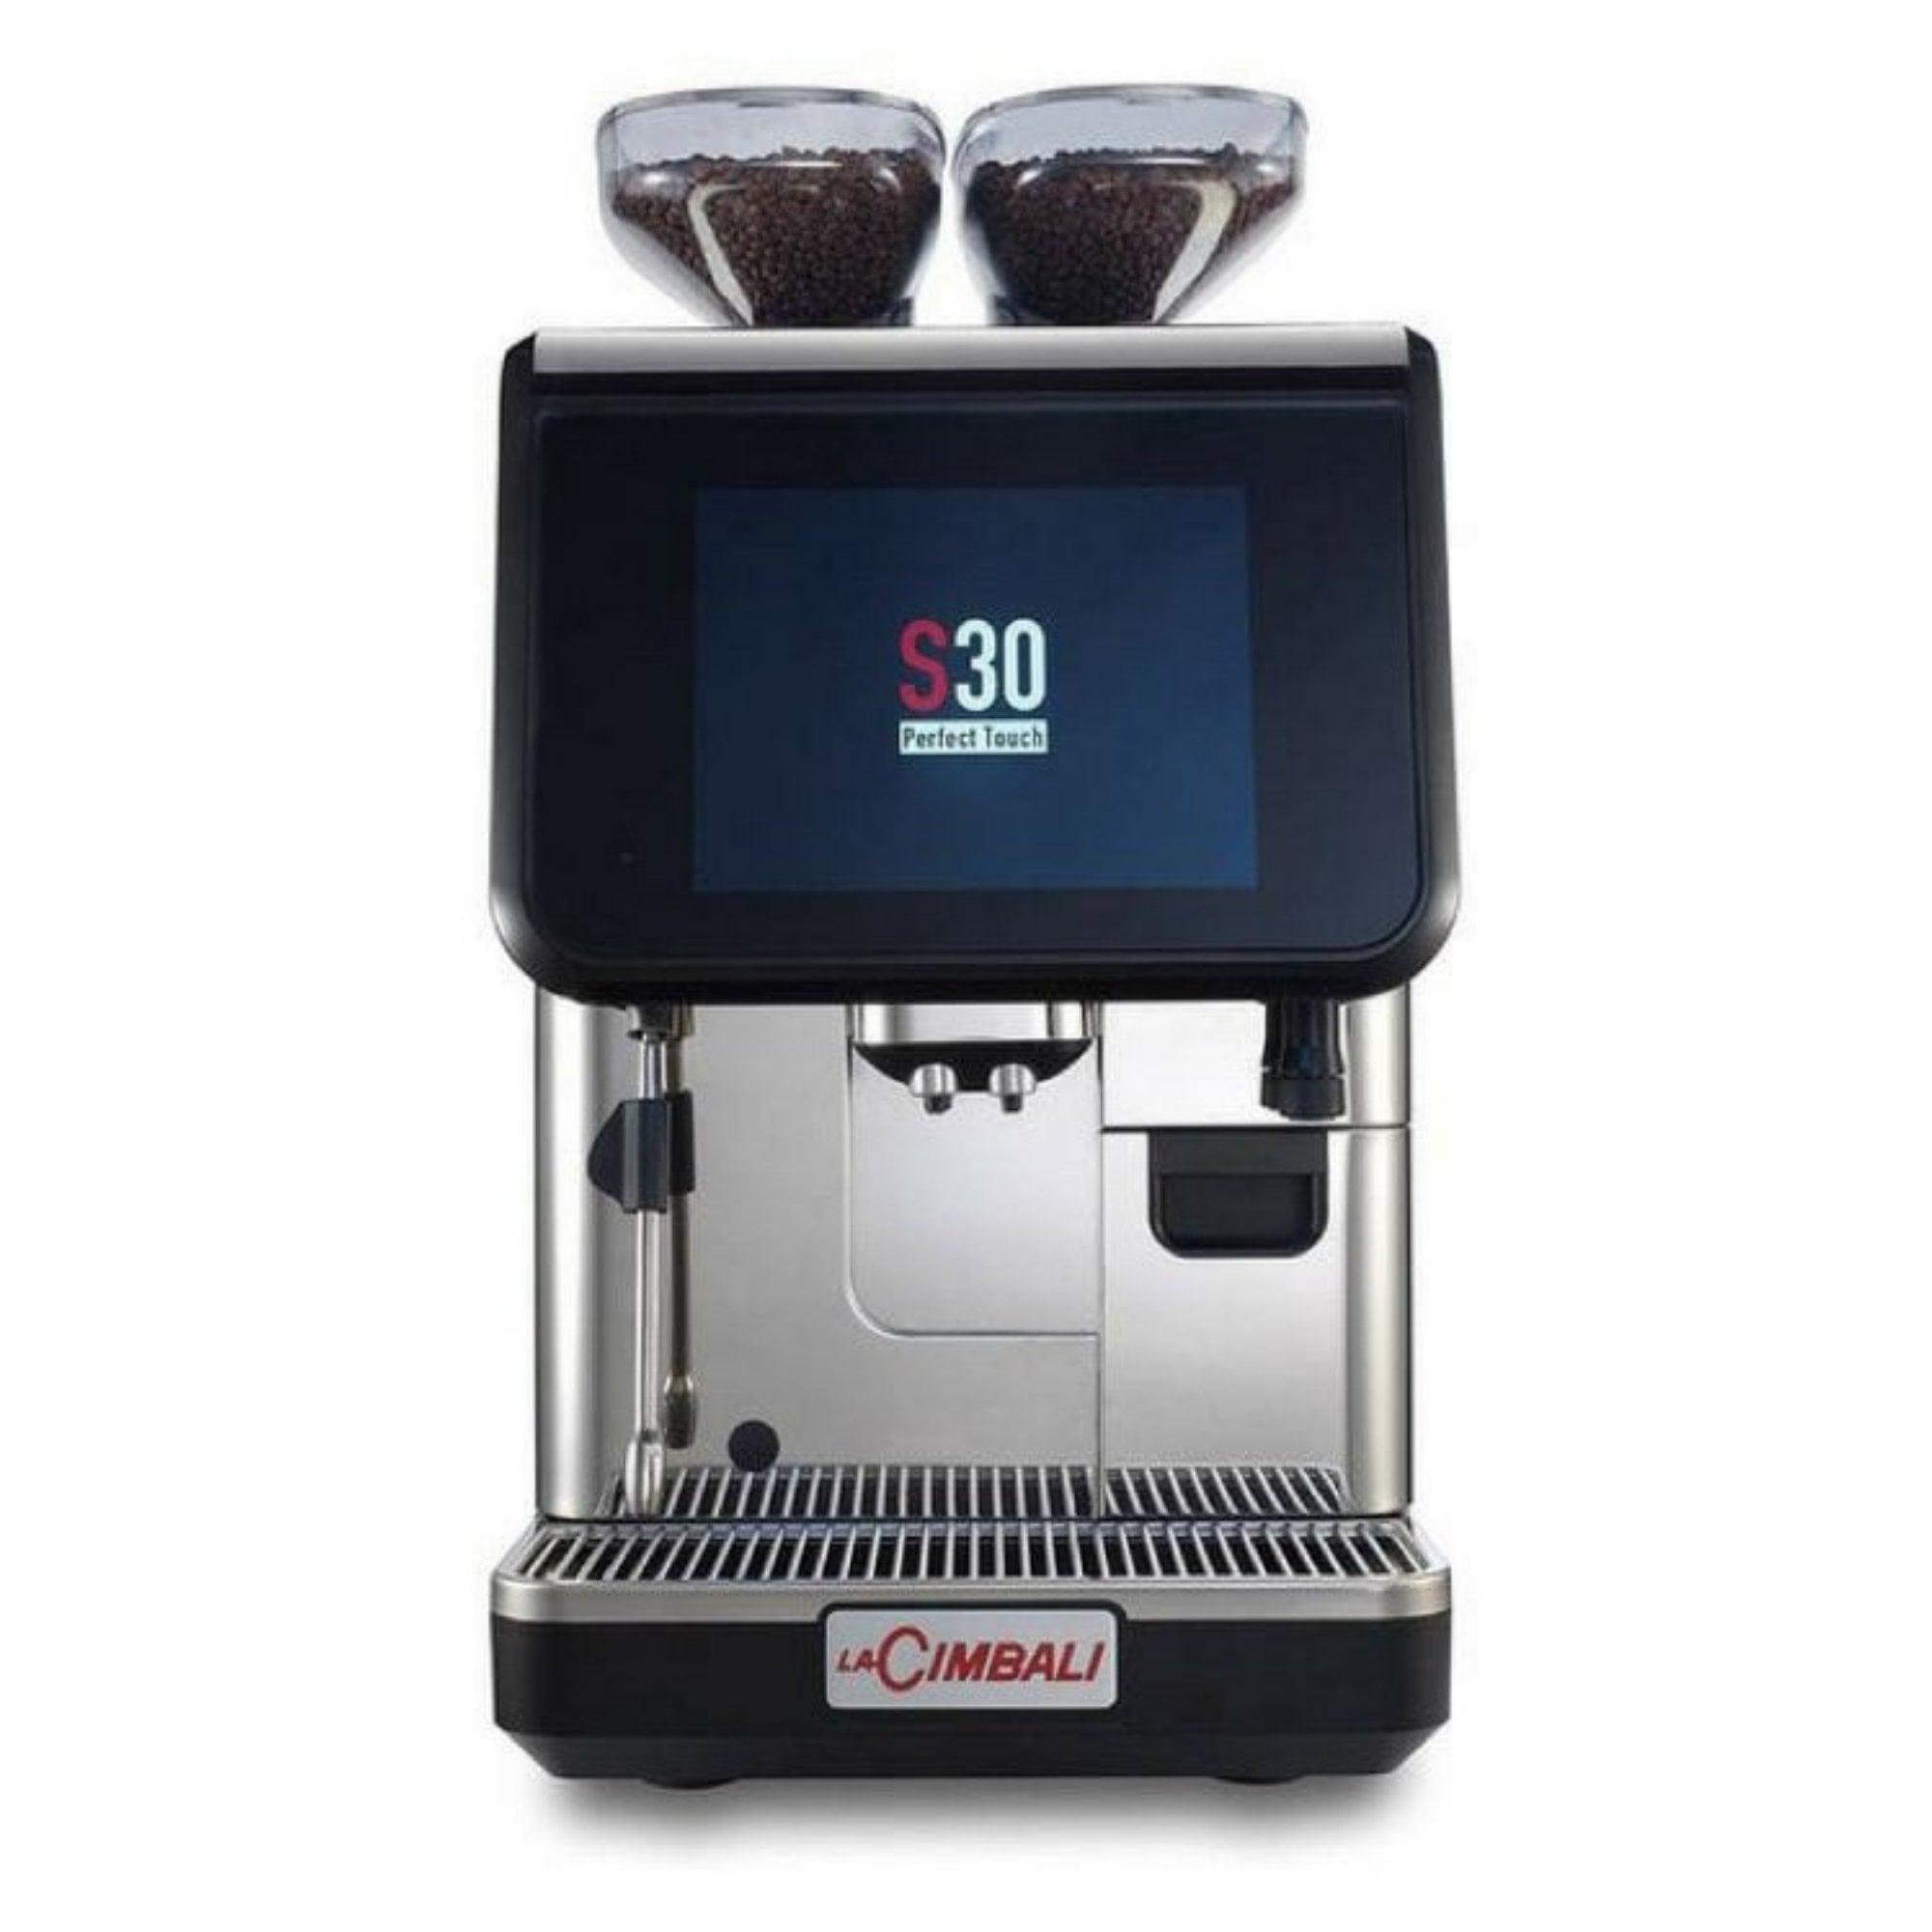 La Cimbali S30 Cs10 Semi Automatic Bean To Cup Machine With